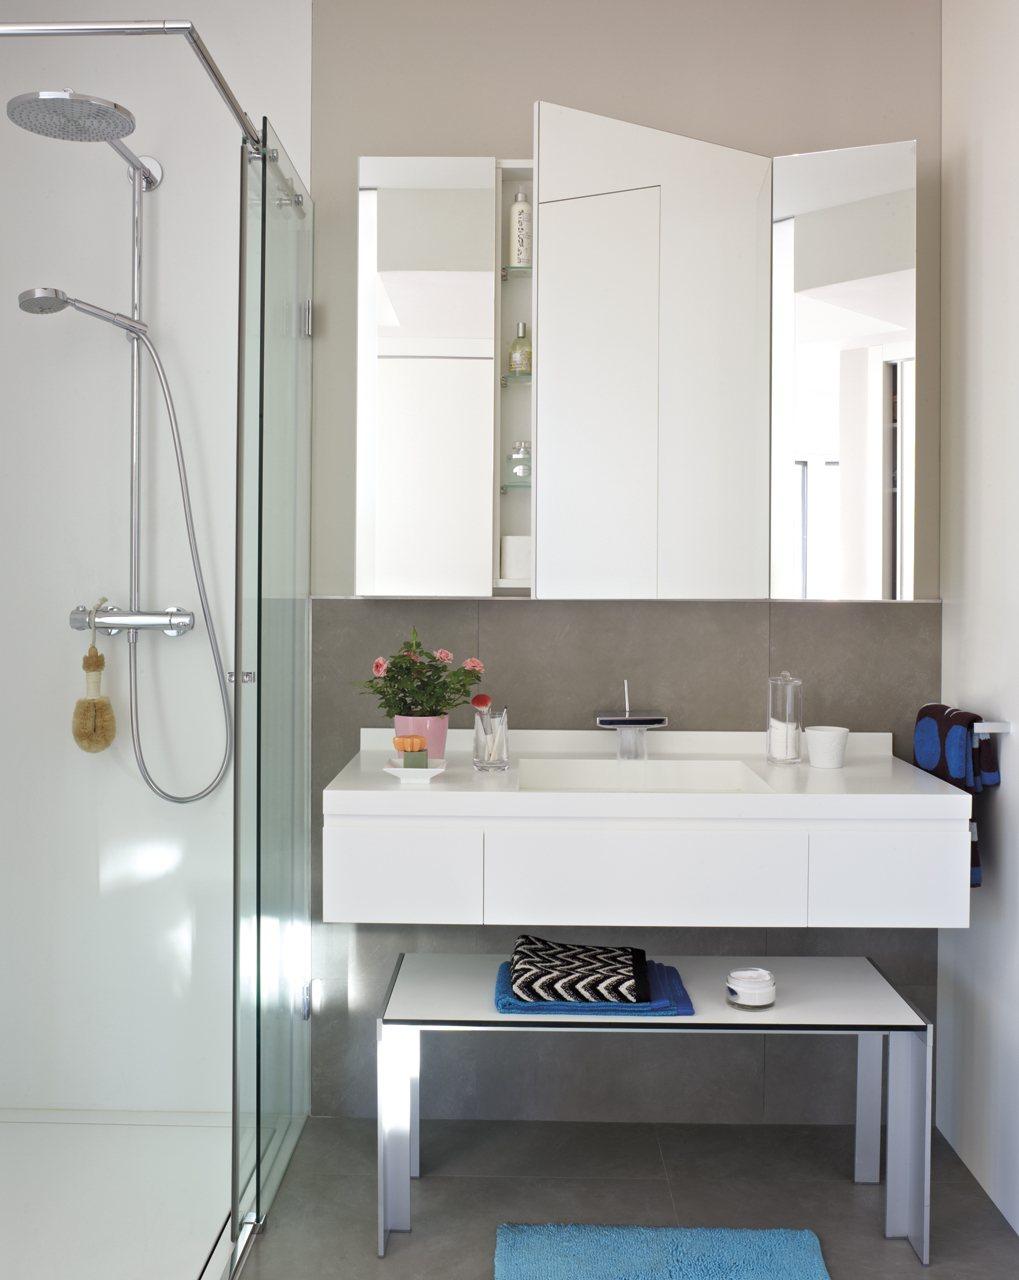 Mobili da italia qualit duchas de bano leroy merlin - Espejo para bano ...